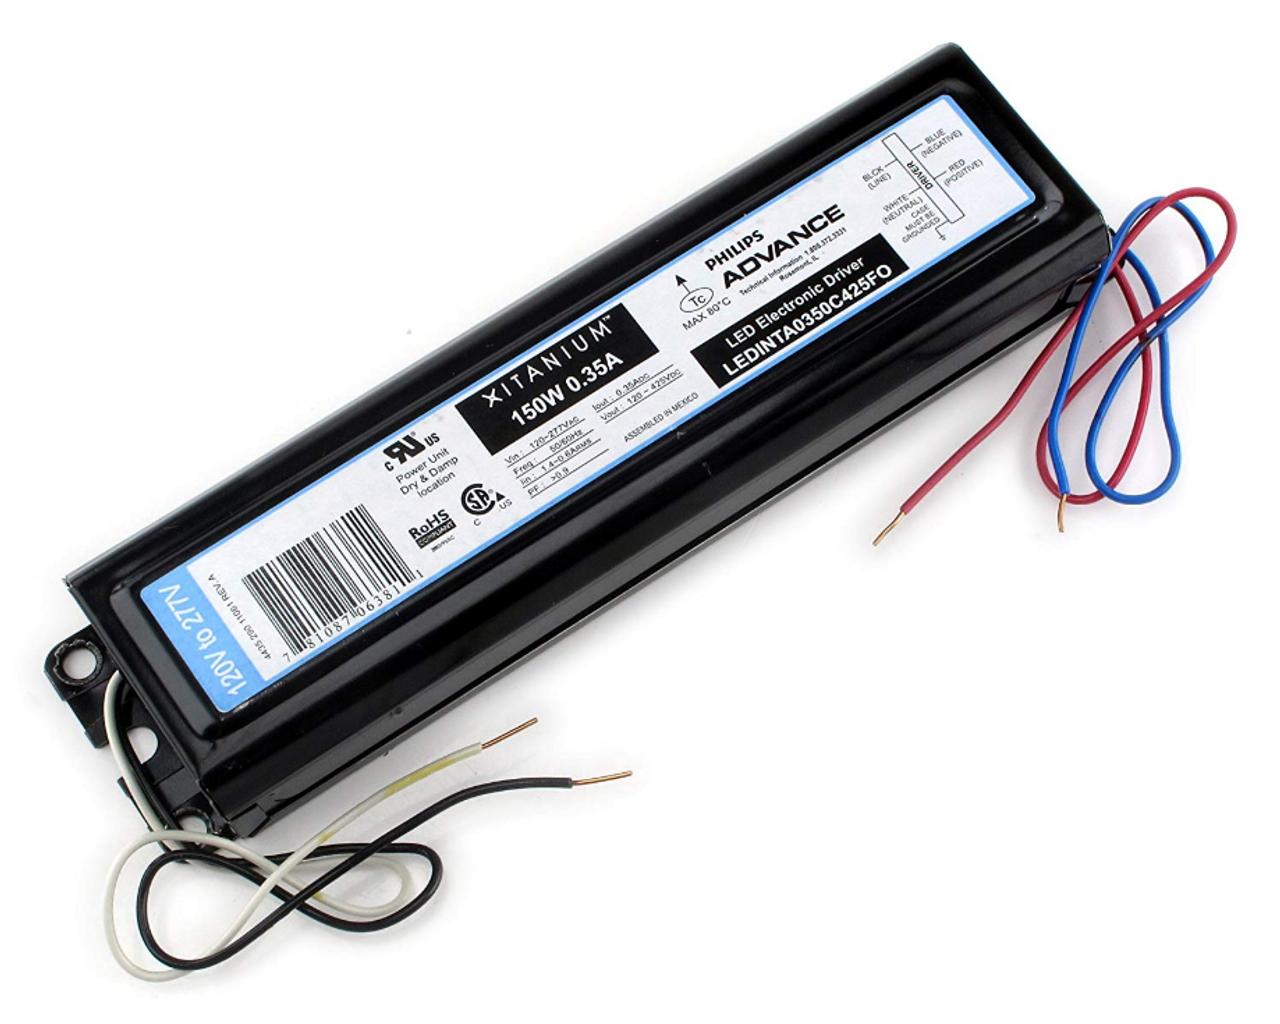 Philips Advance Xitanium Ledinta0350c425fo LED Electronic Driver 150w .35a for sale online